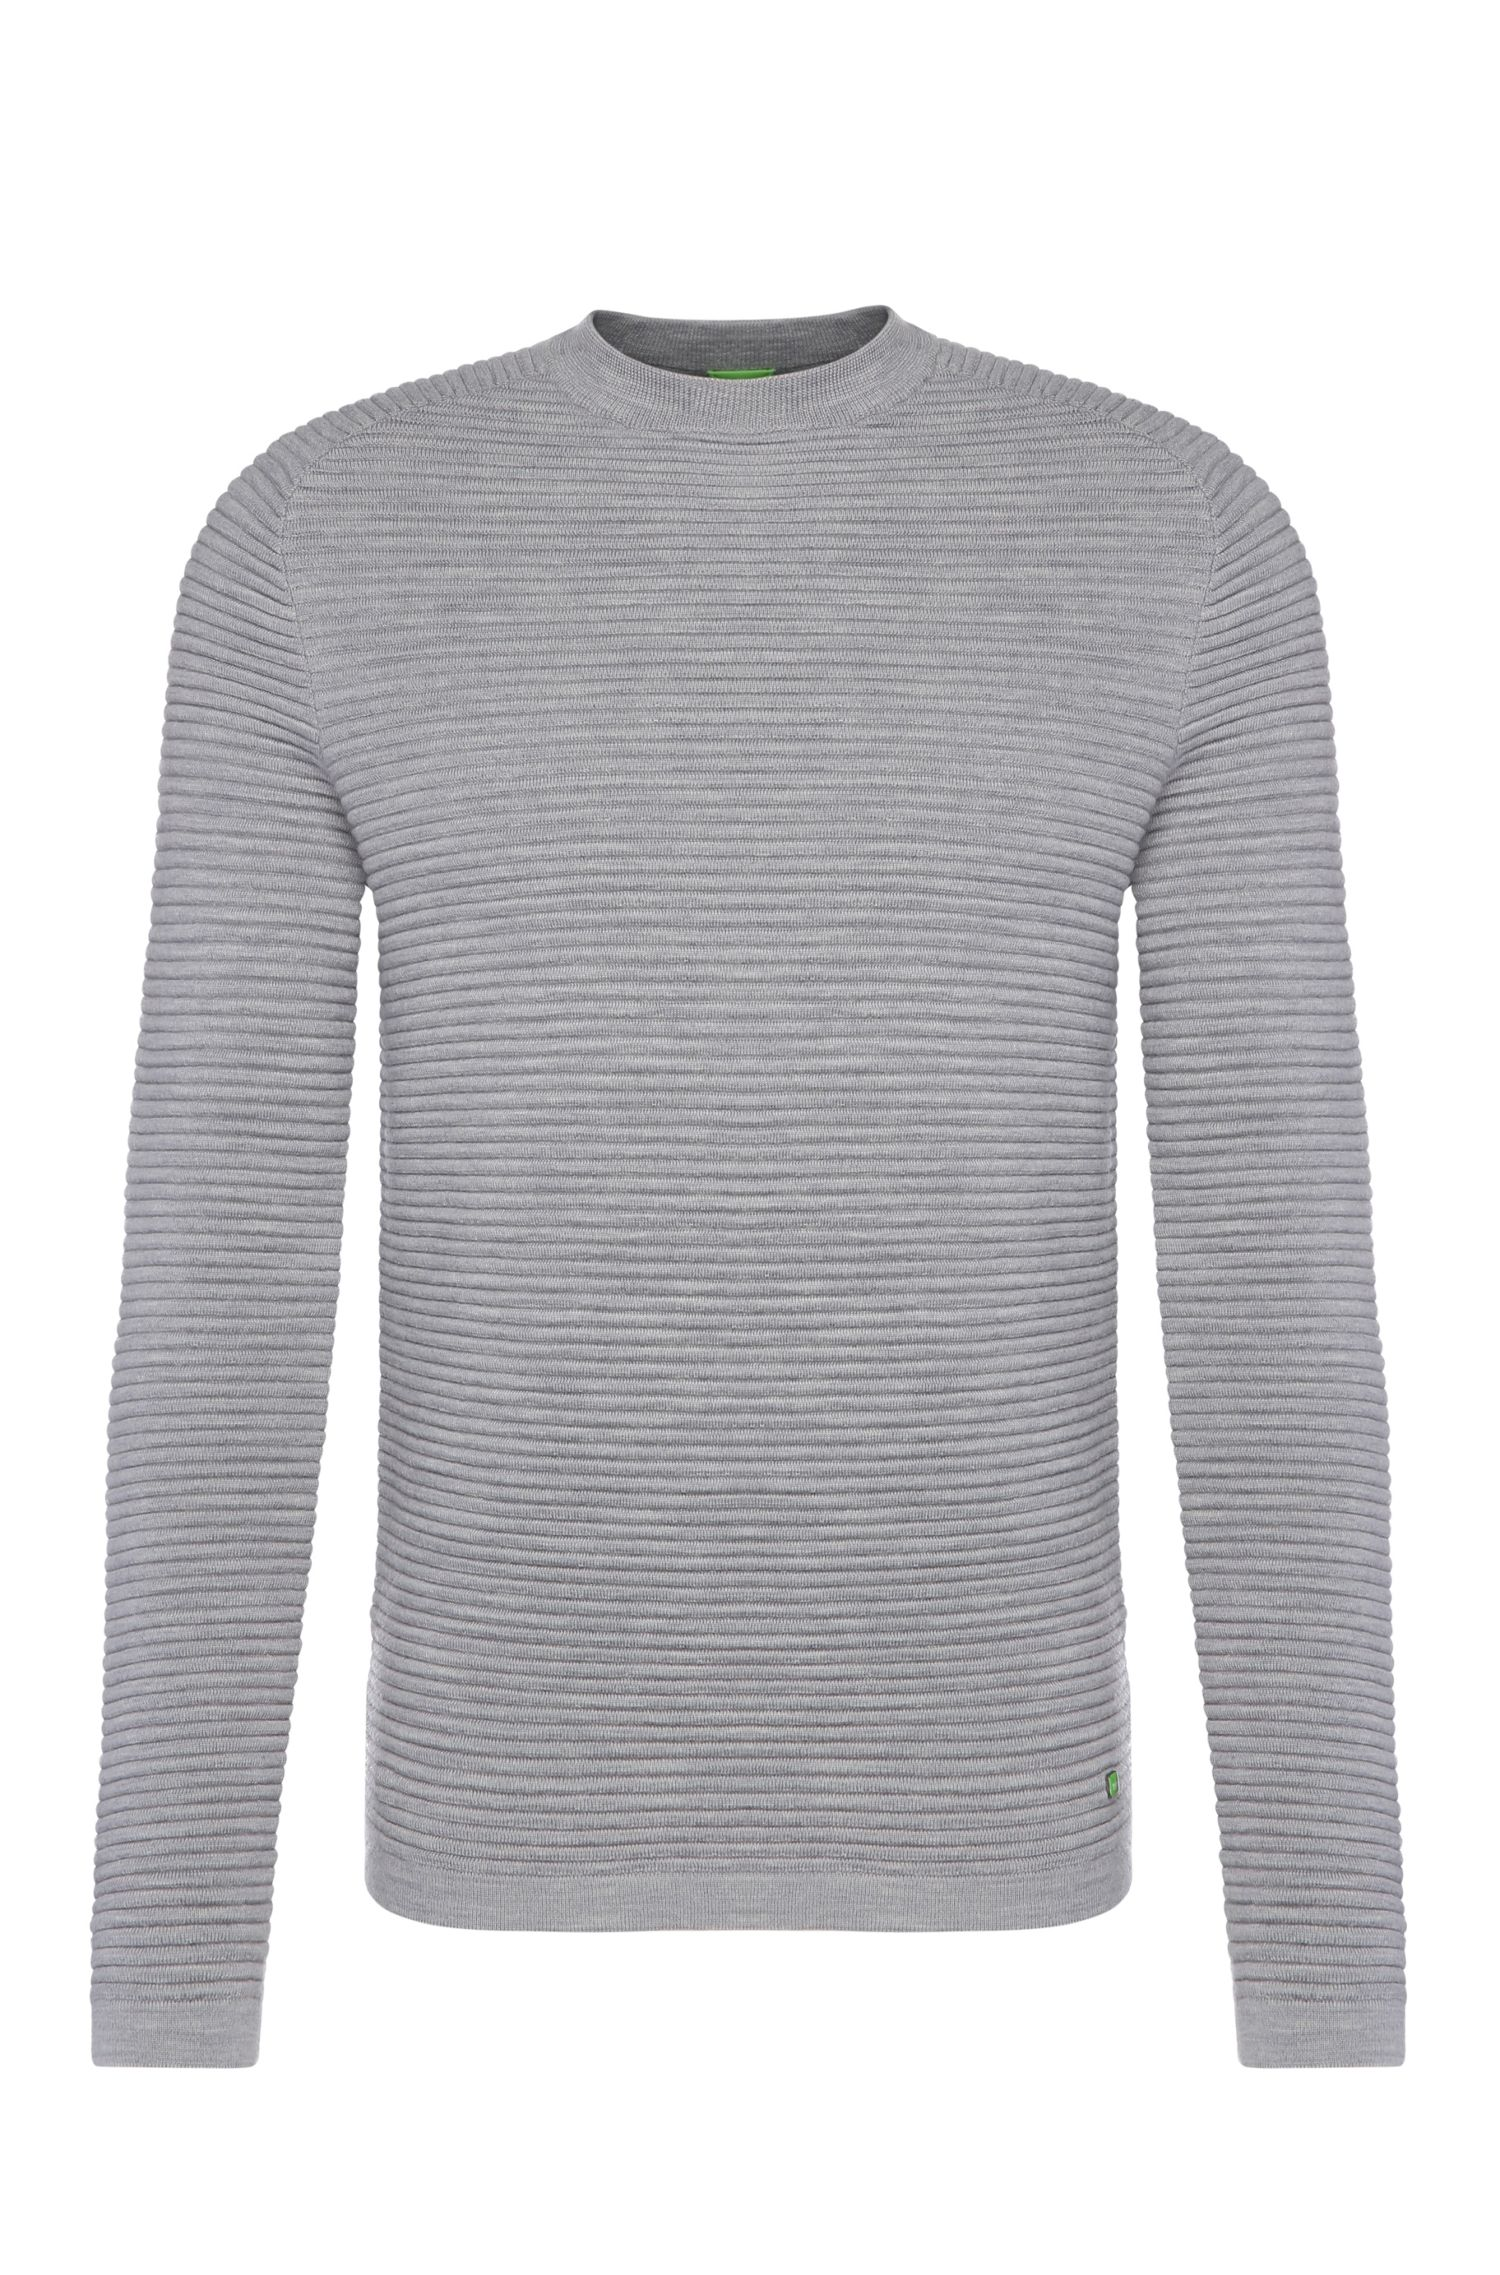 'Ree' | Virgin Wool Ottoman Rib Sweater